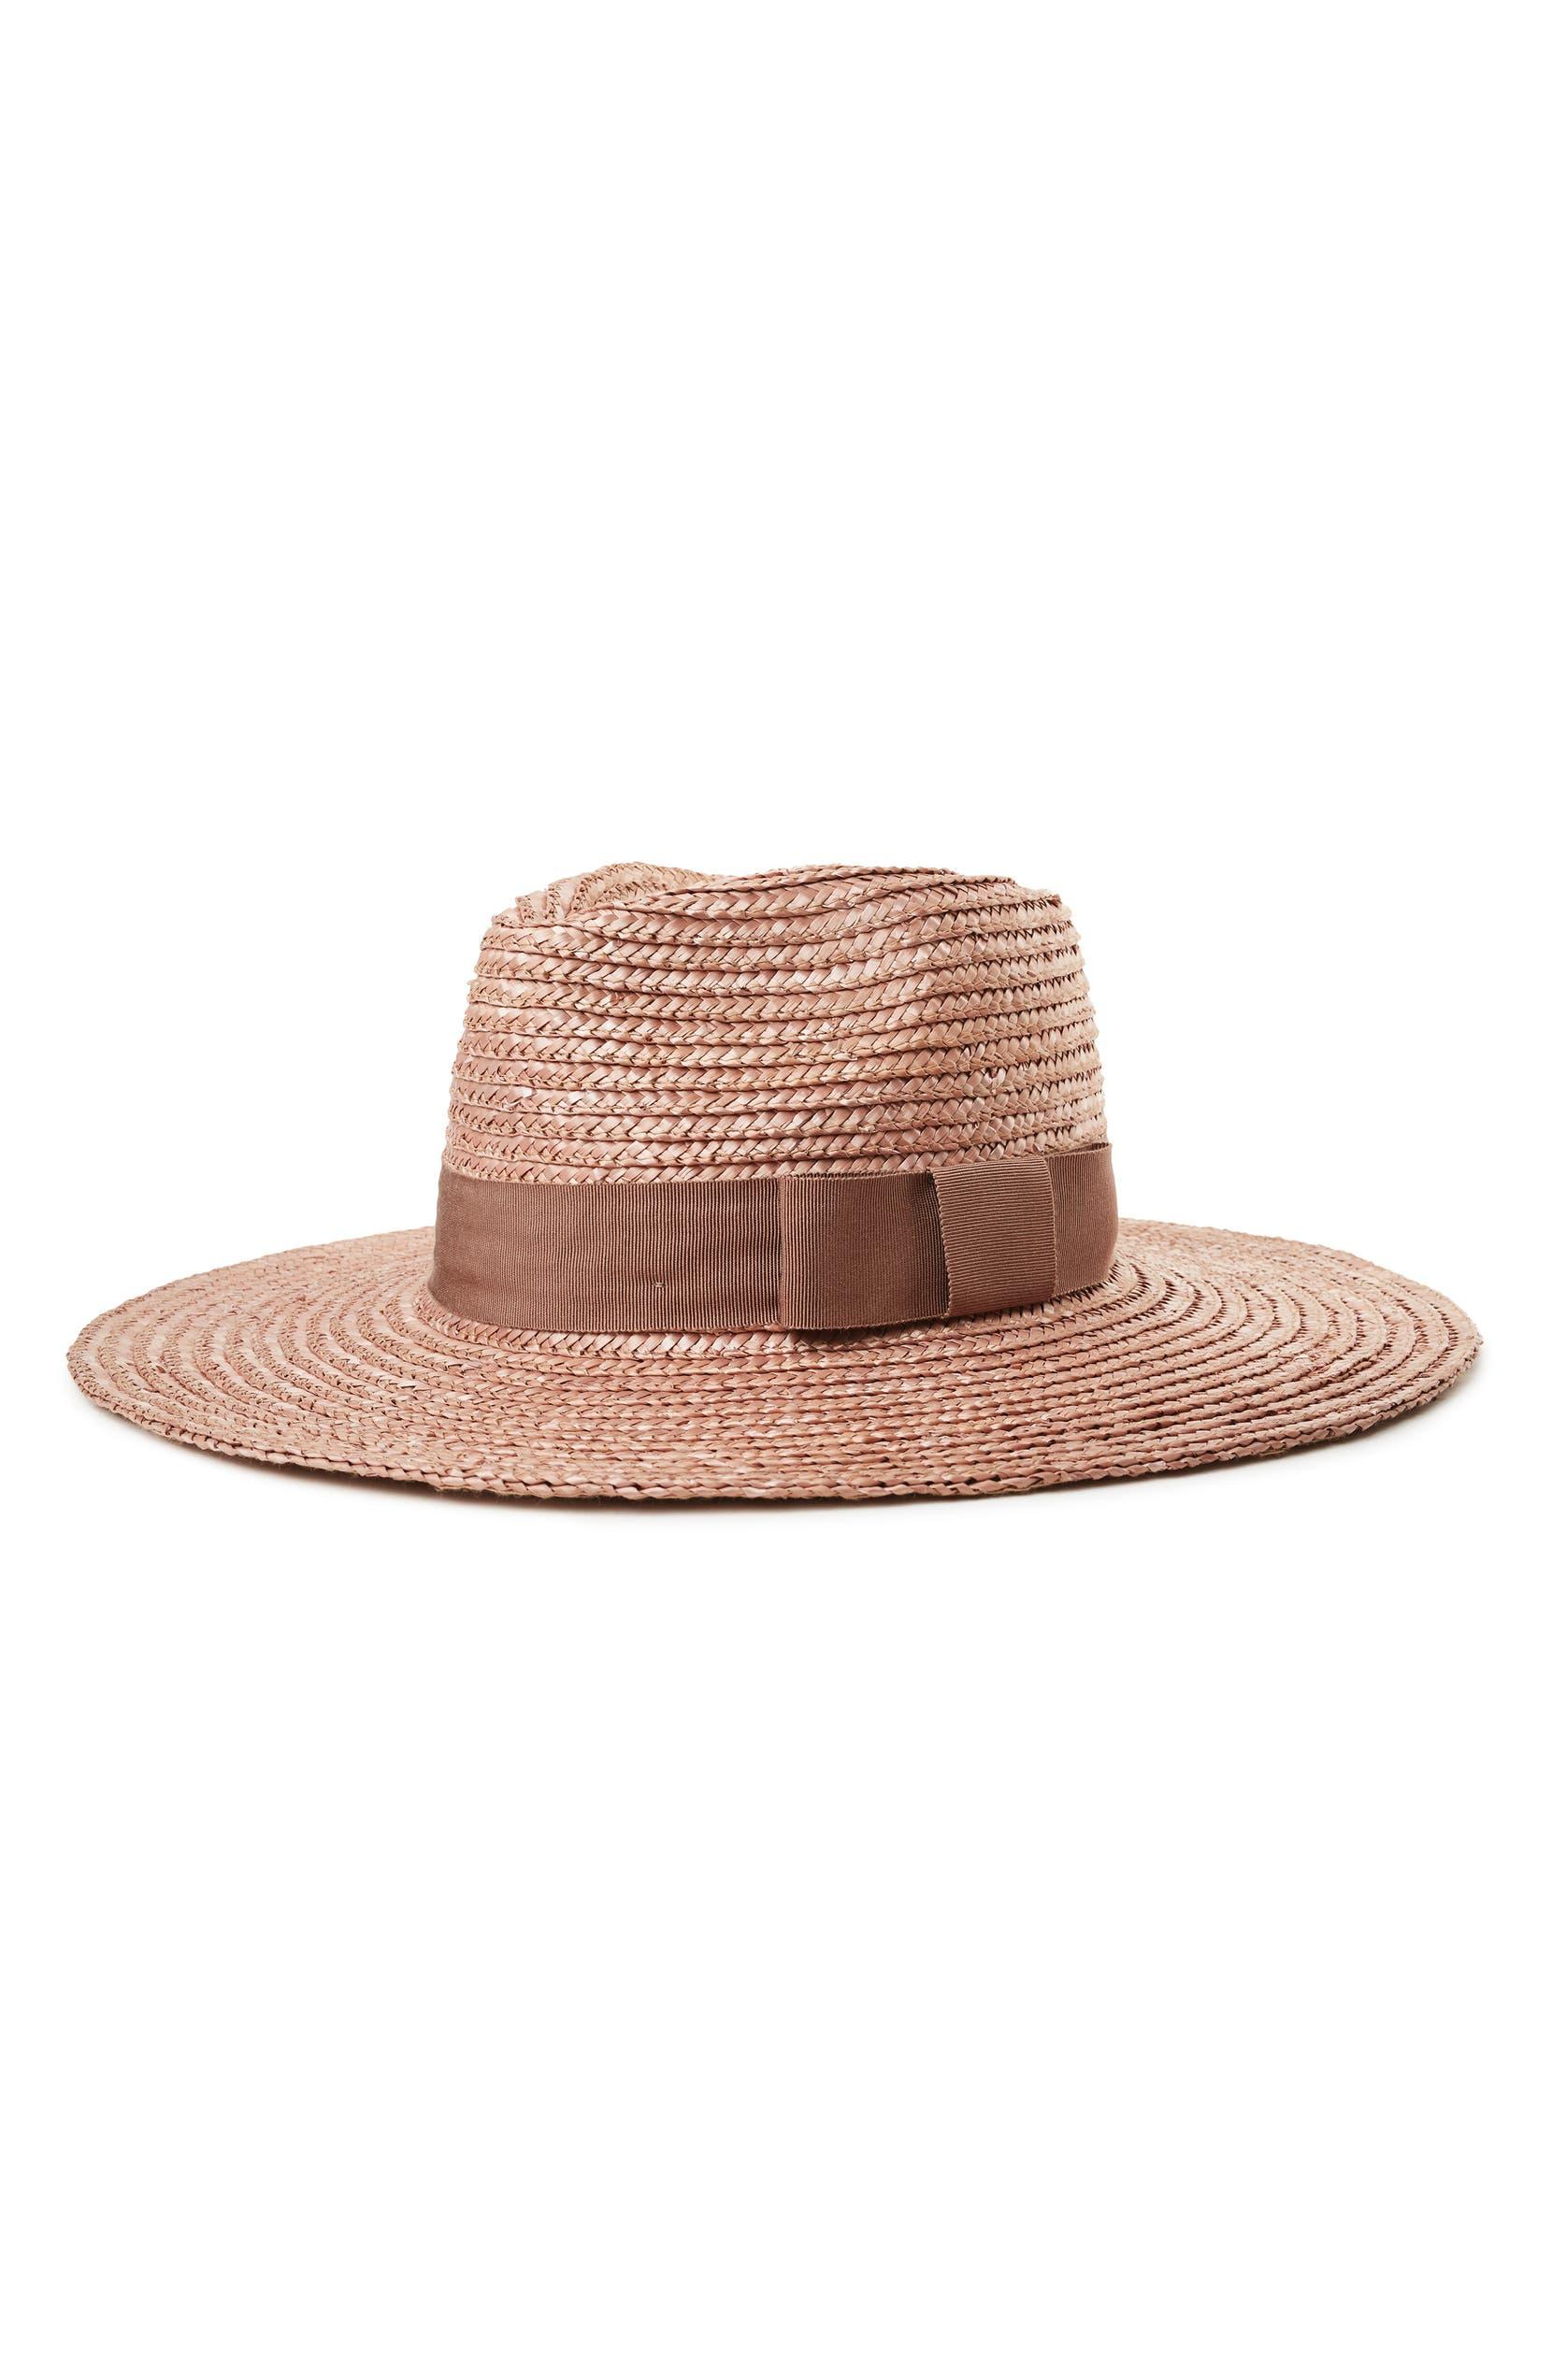 b2b2adc9b75 Brixton  Joanna  Straw Hat